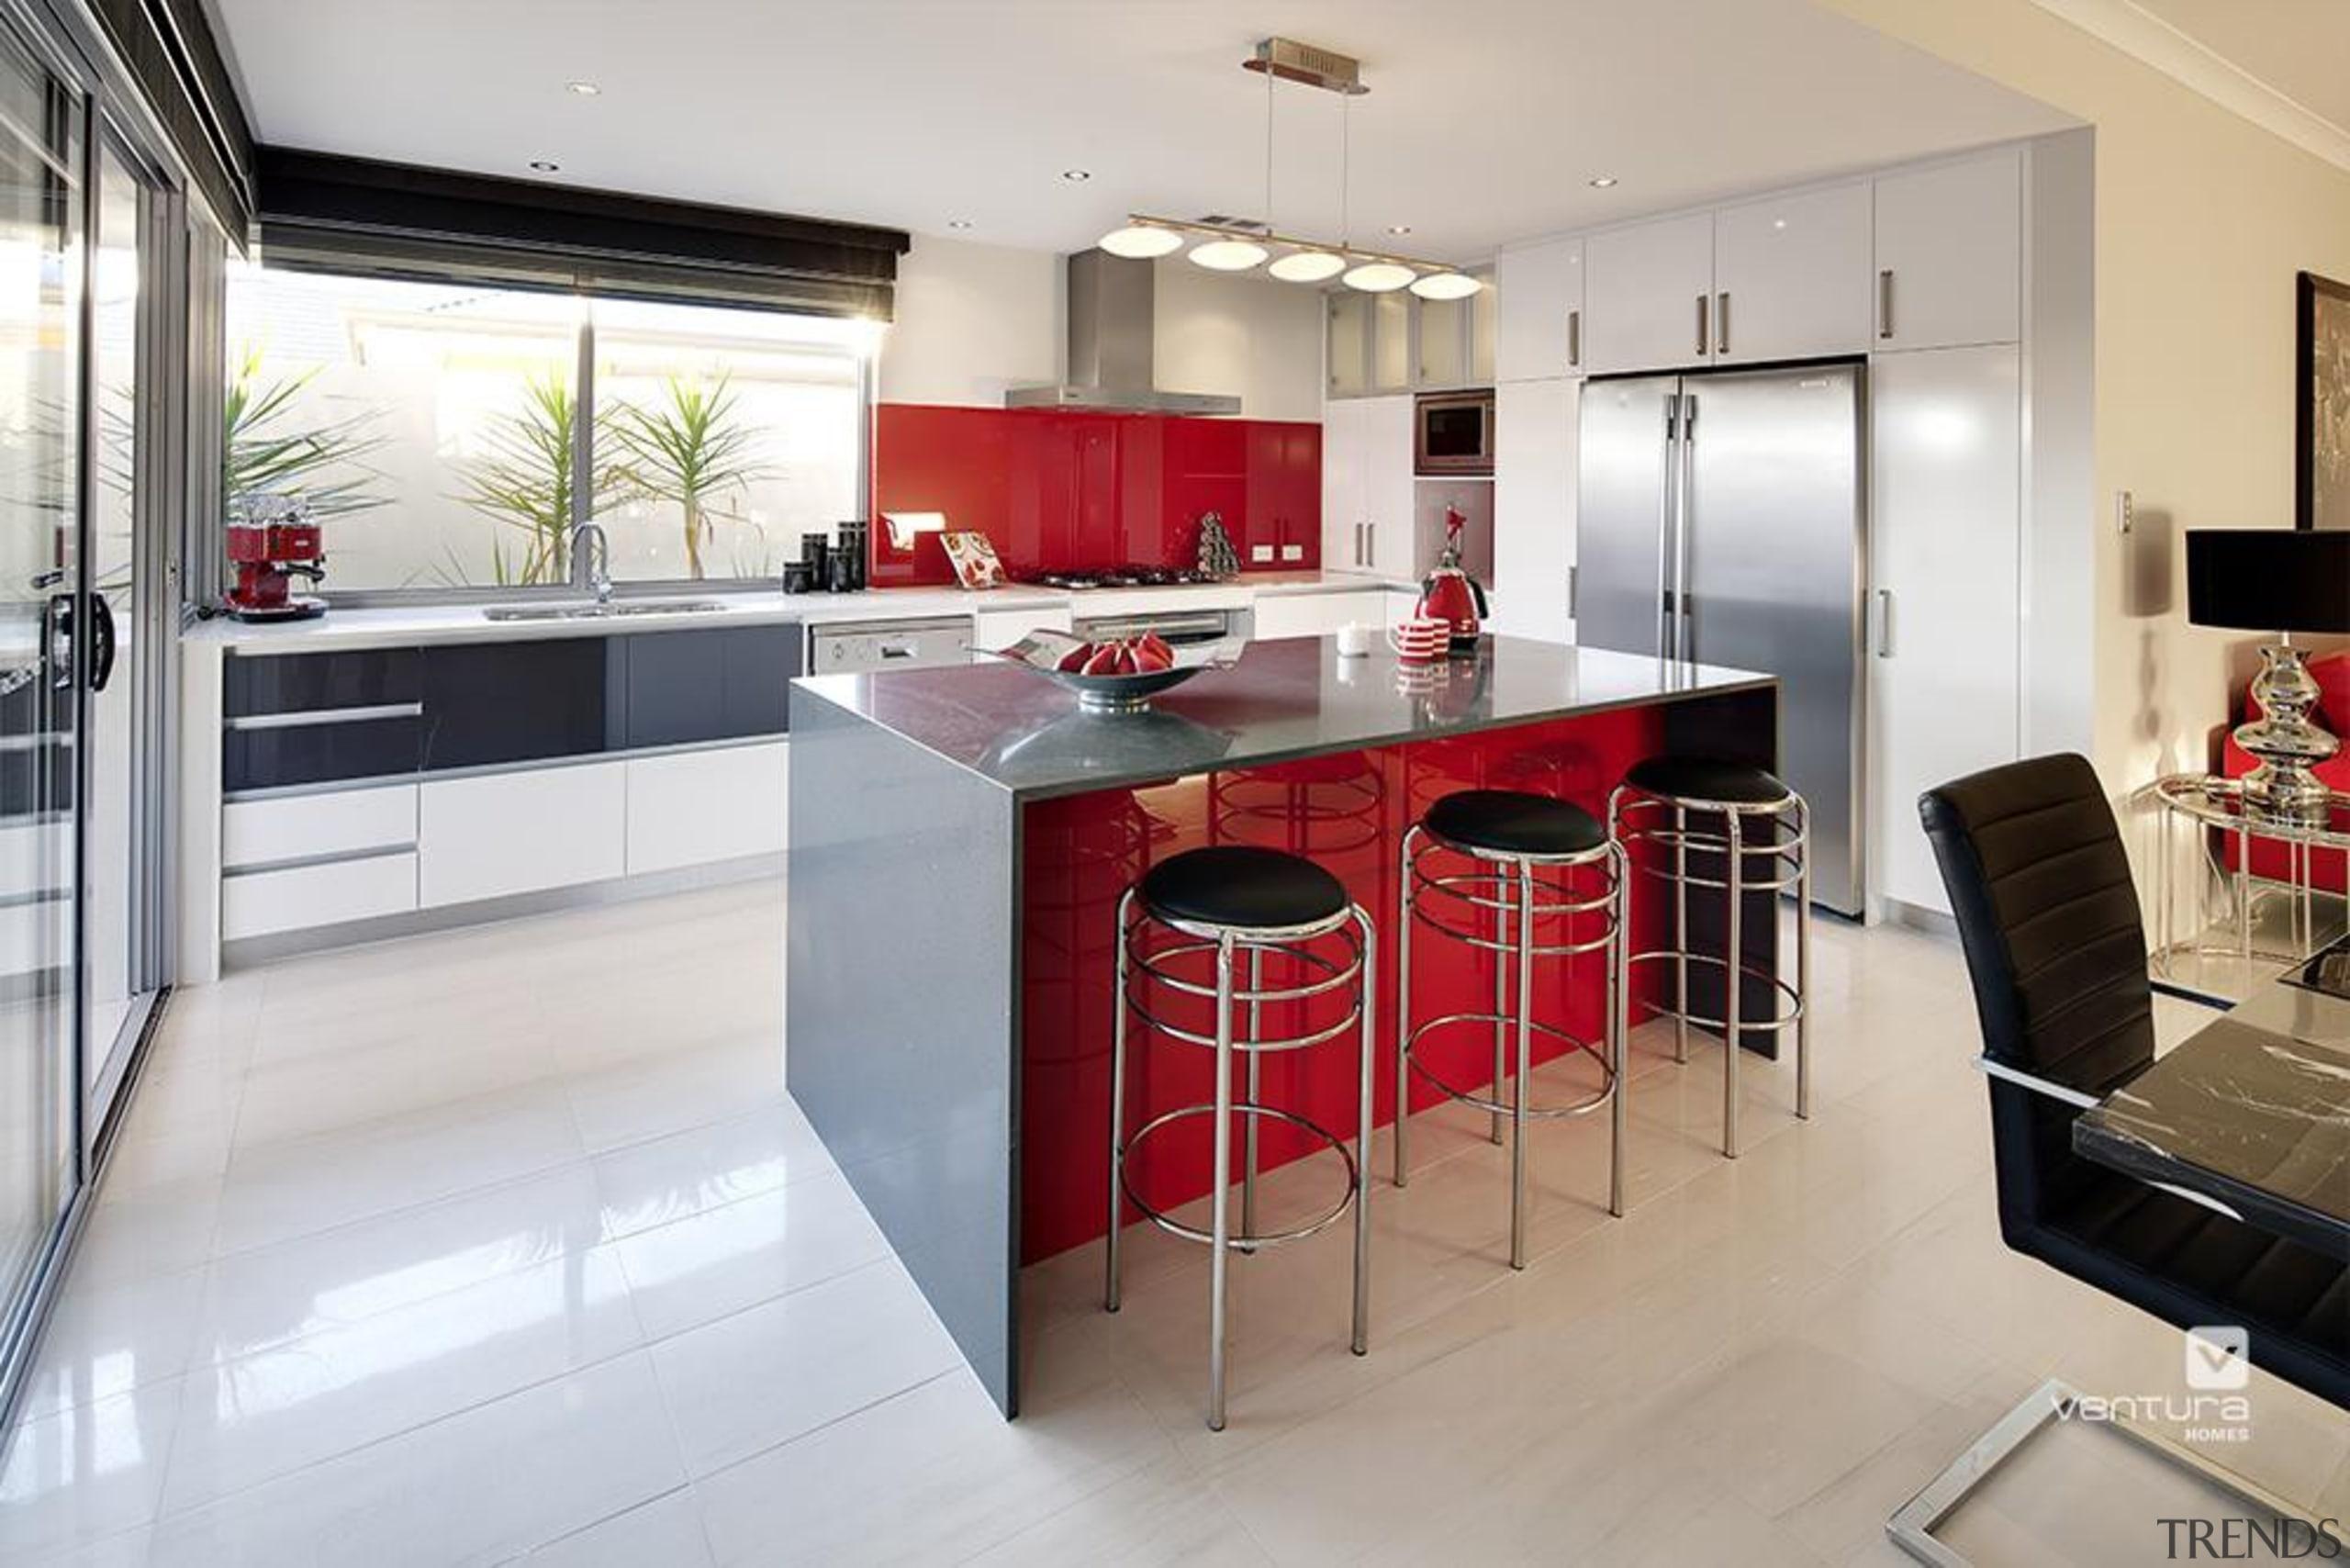 Kitchen design. - The Essence Display Home - cabinetry, countertop, cuisine classique, interior design, kitchen, room, gray